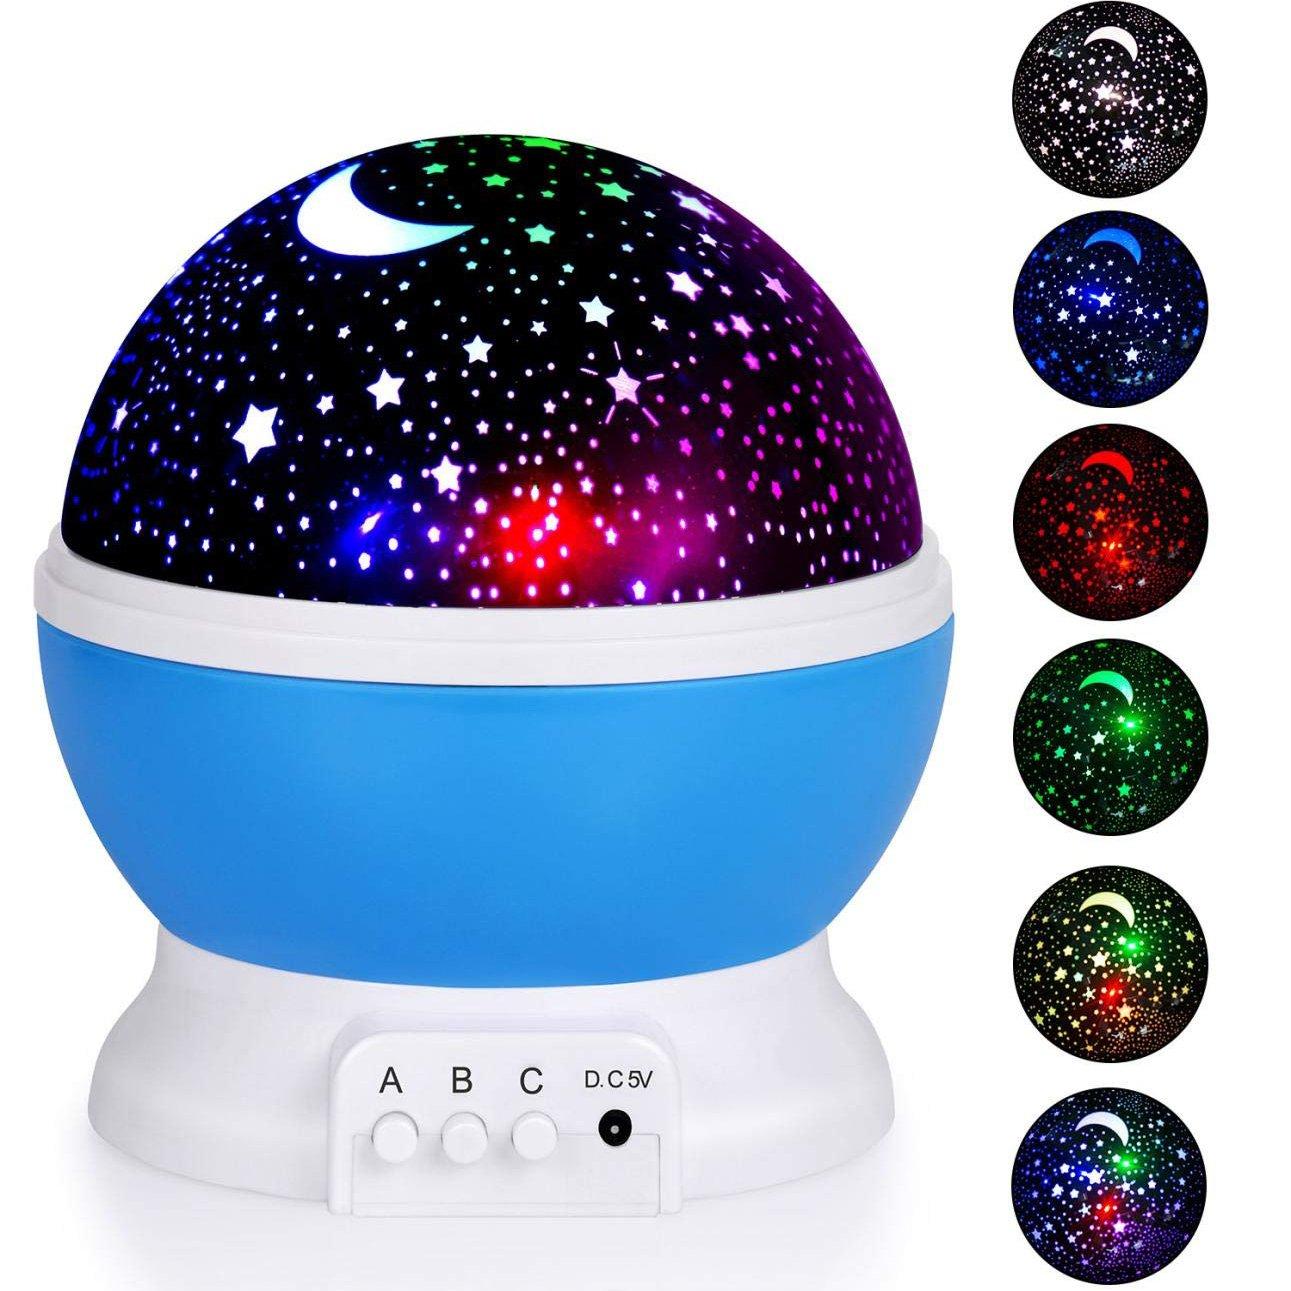 GM10472 Star Night Light